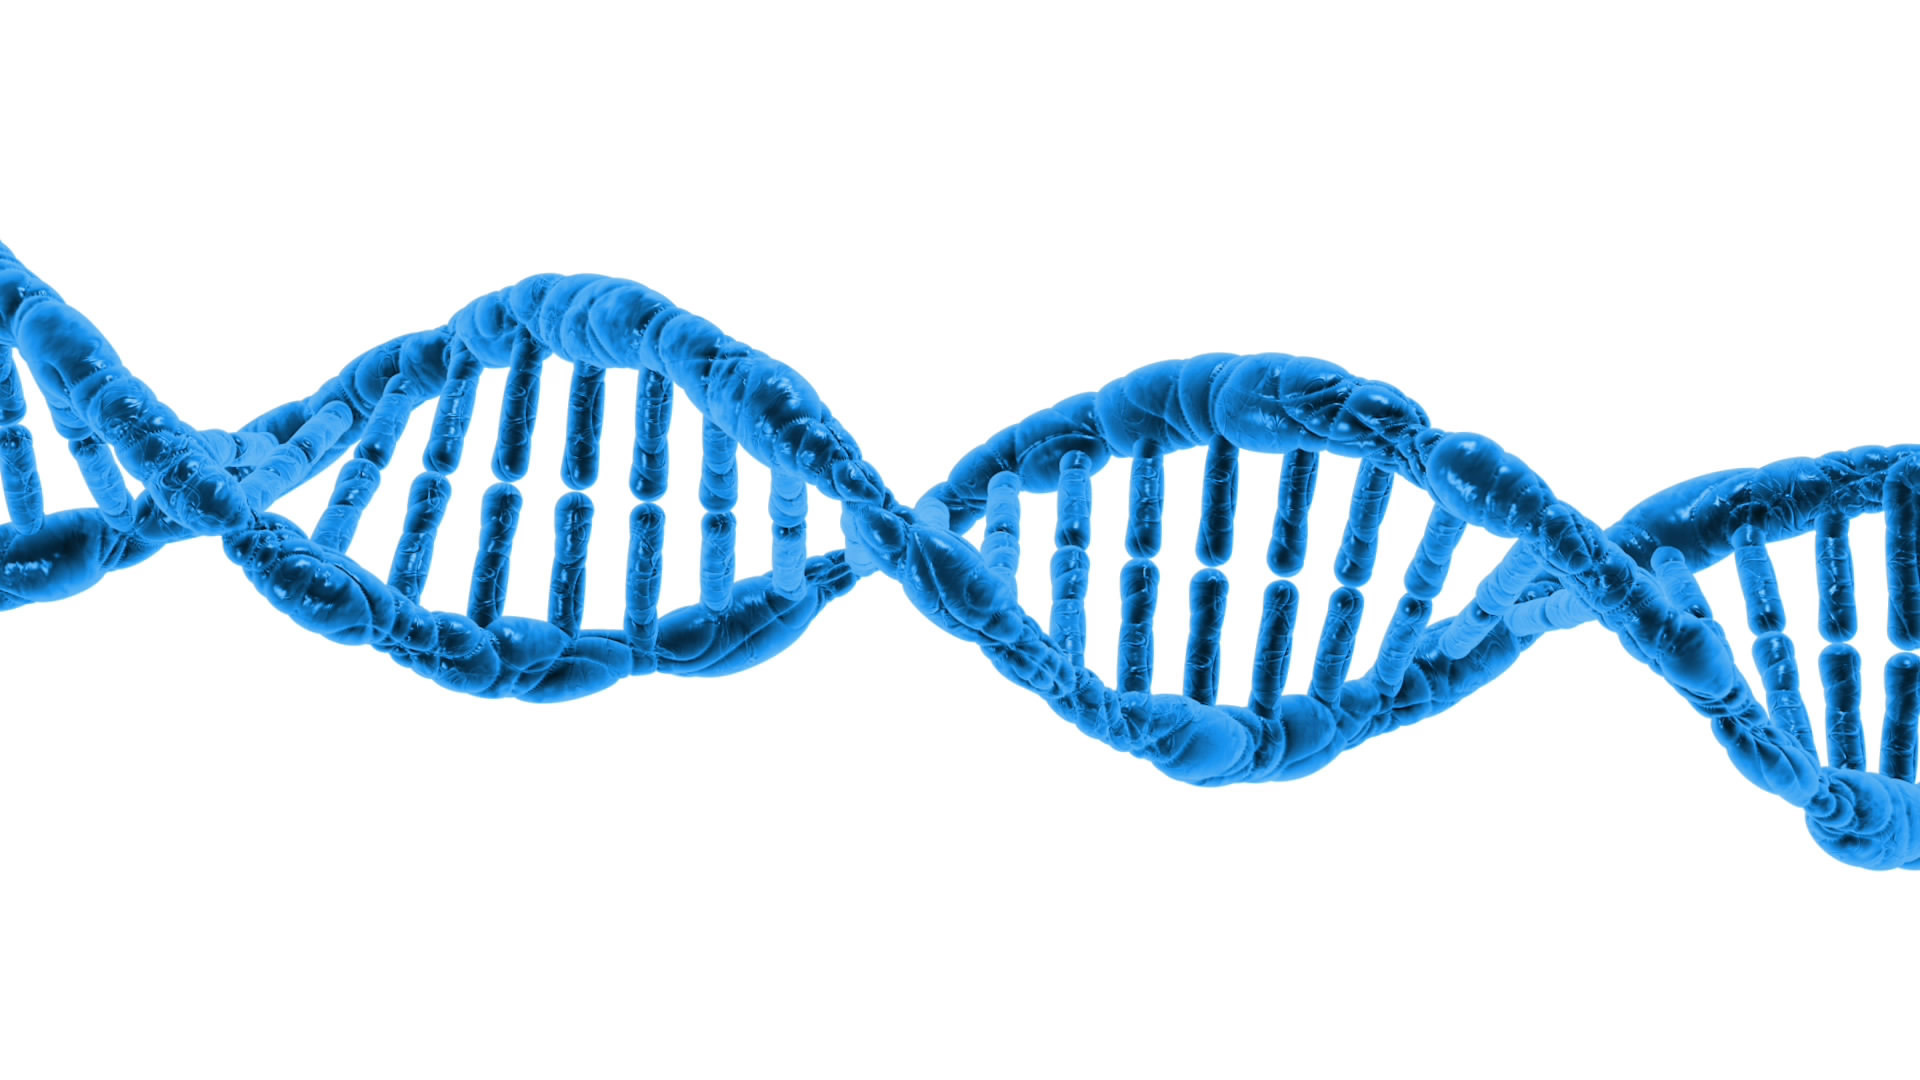 Variation  - Edexcel 9-1 GCSE Biology: Topic 3, lesson 7 Variation